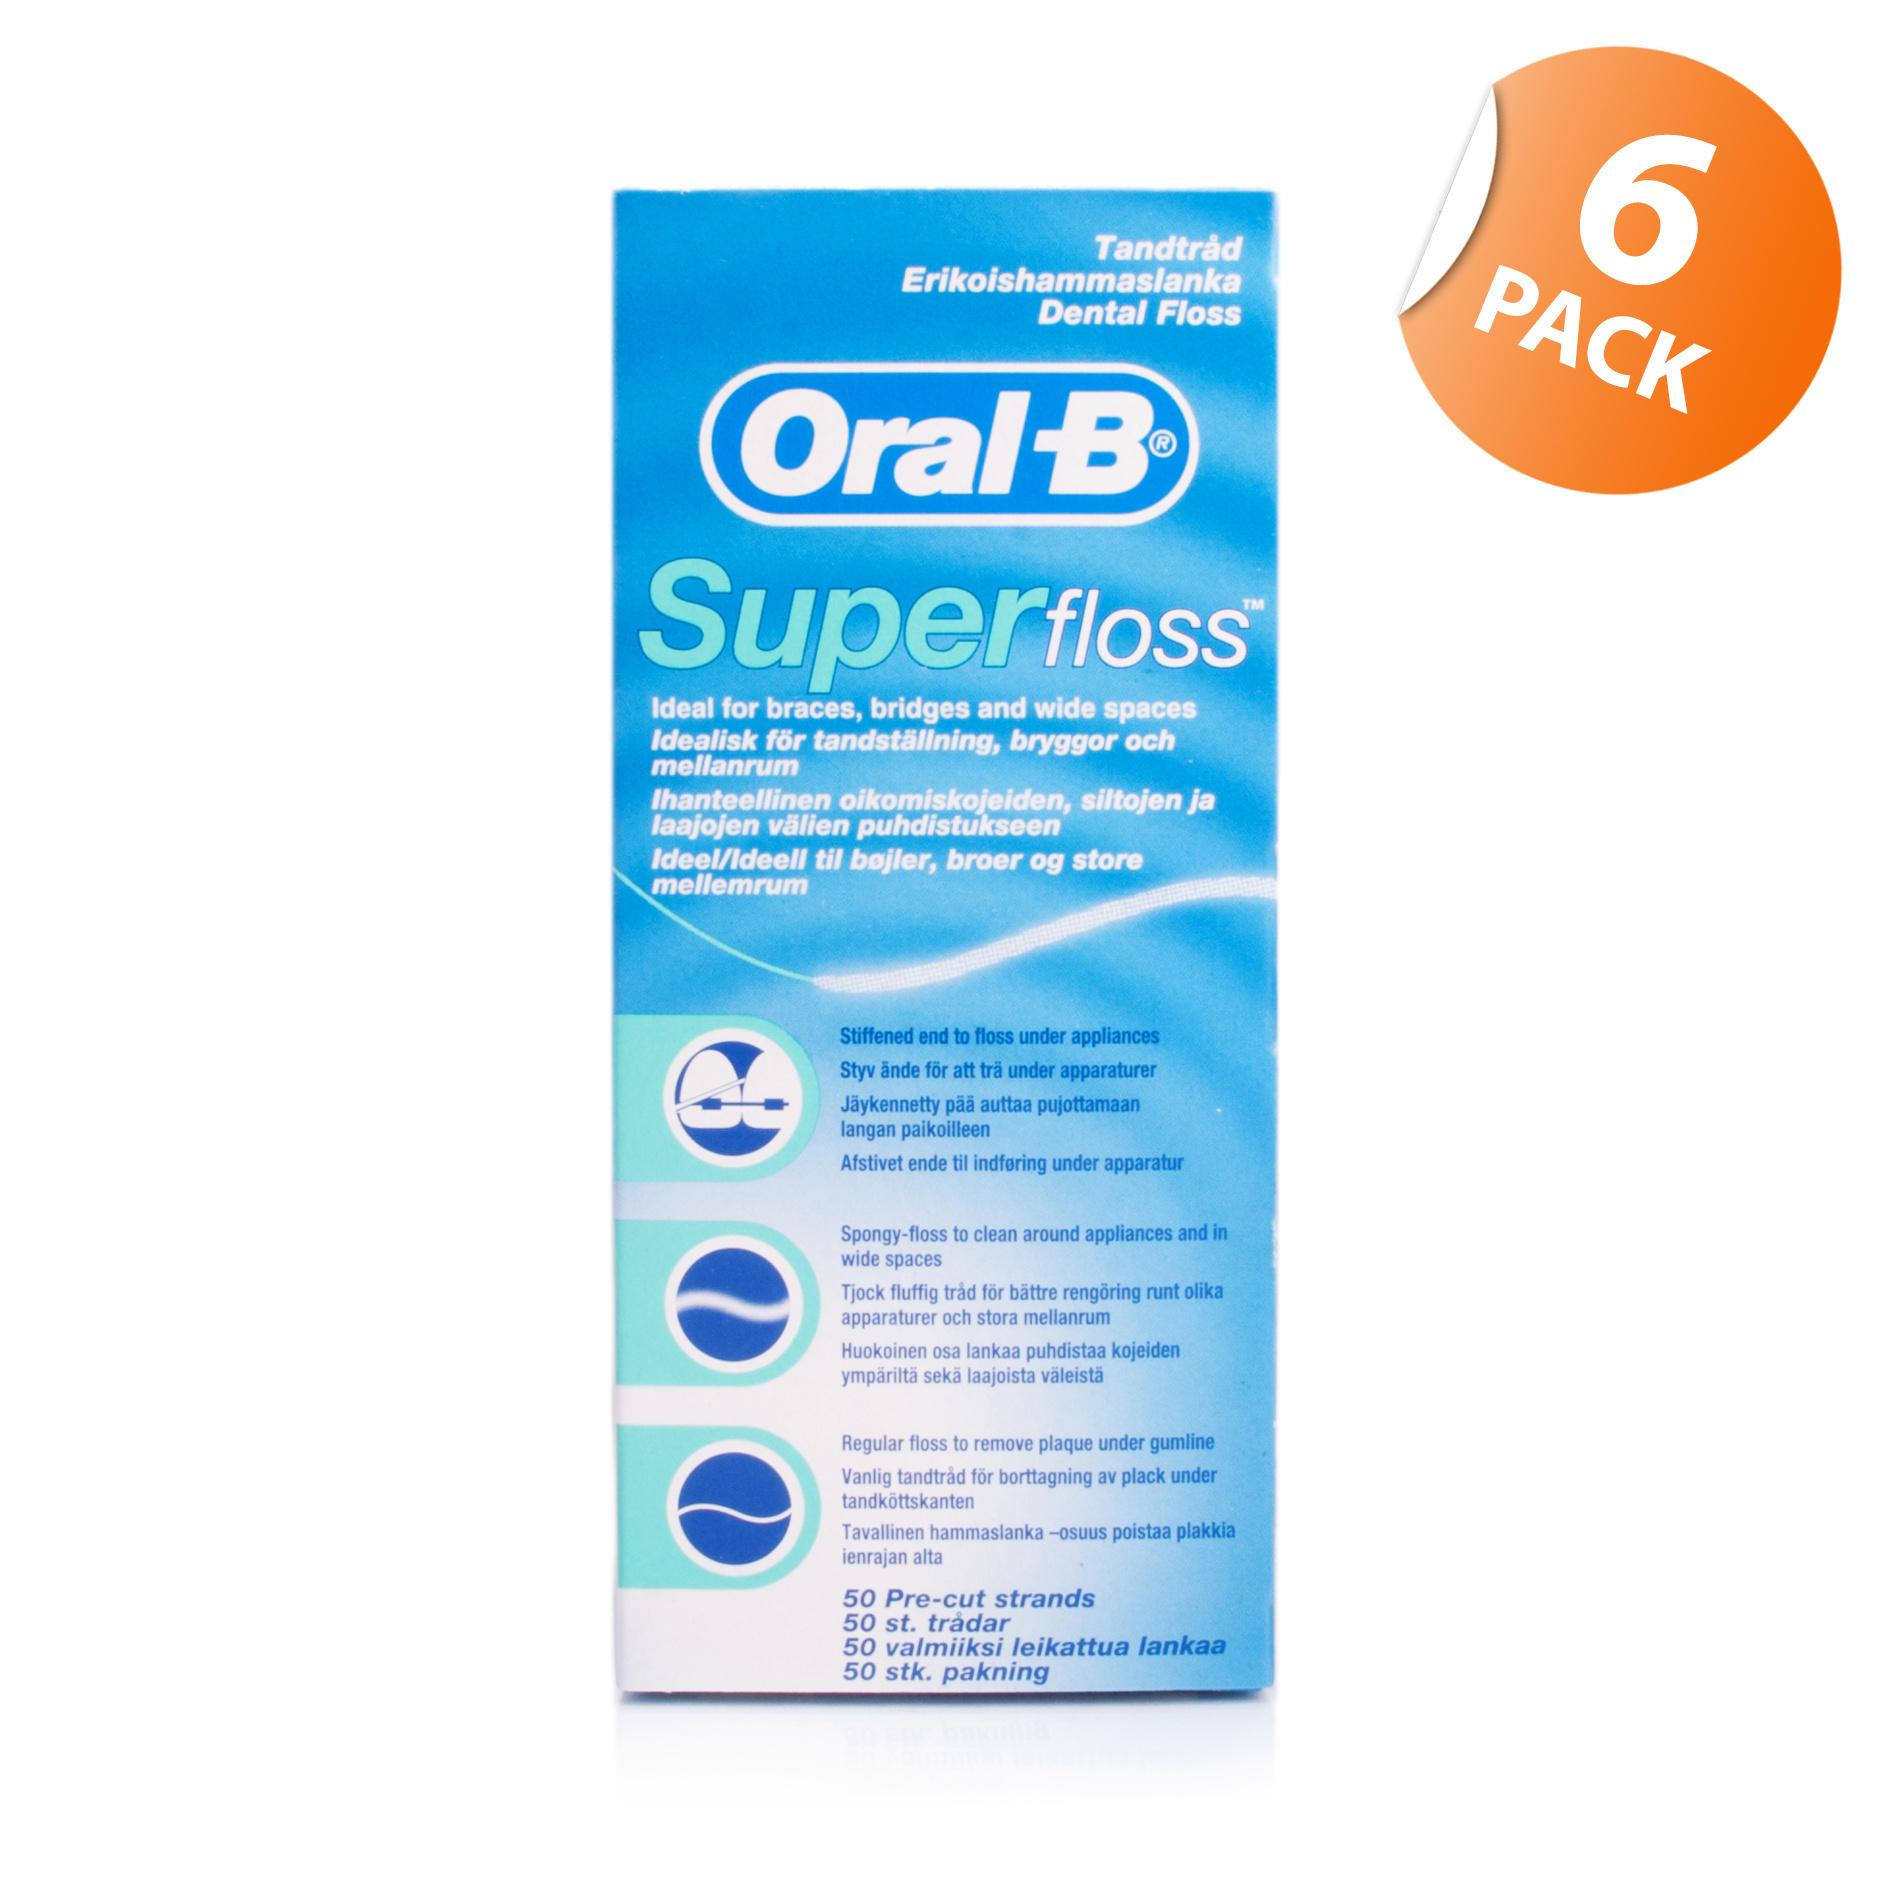 Oral-B Super Floss 6 Pack